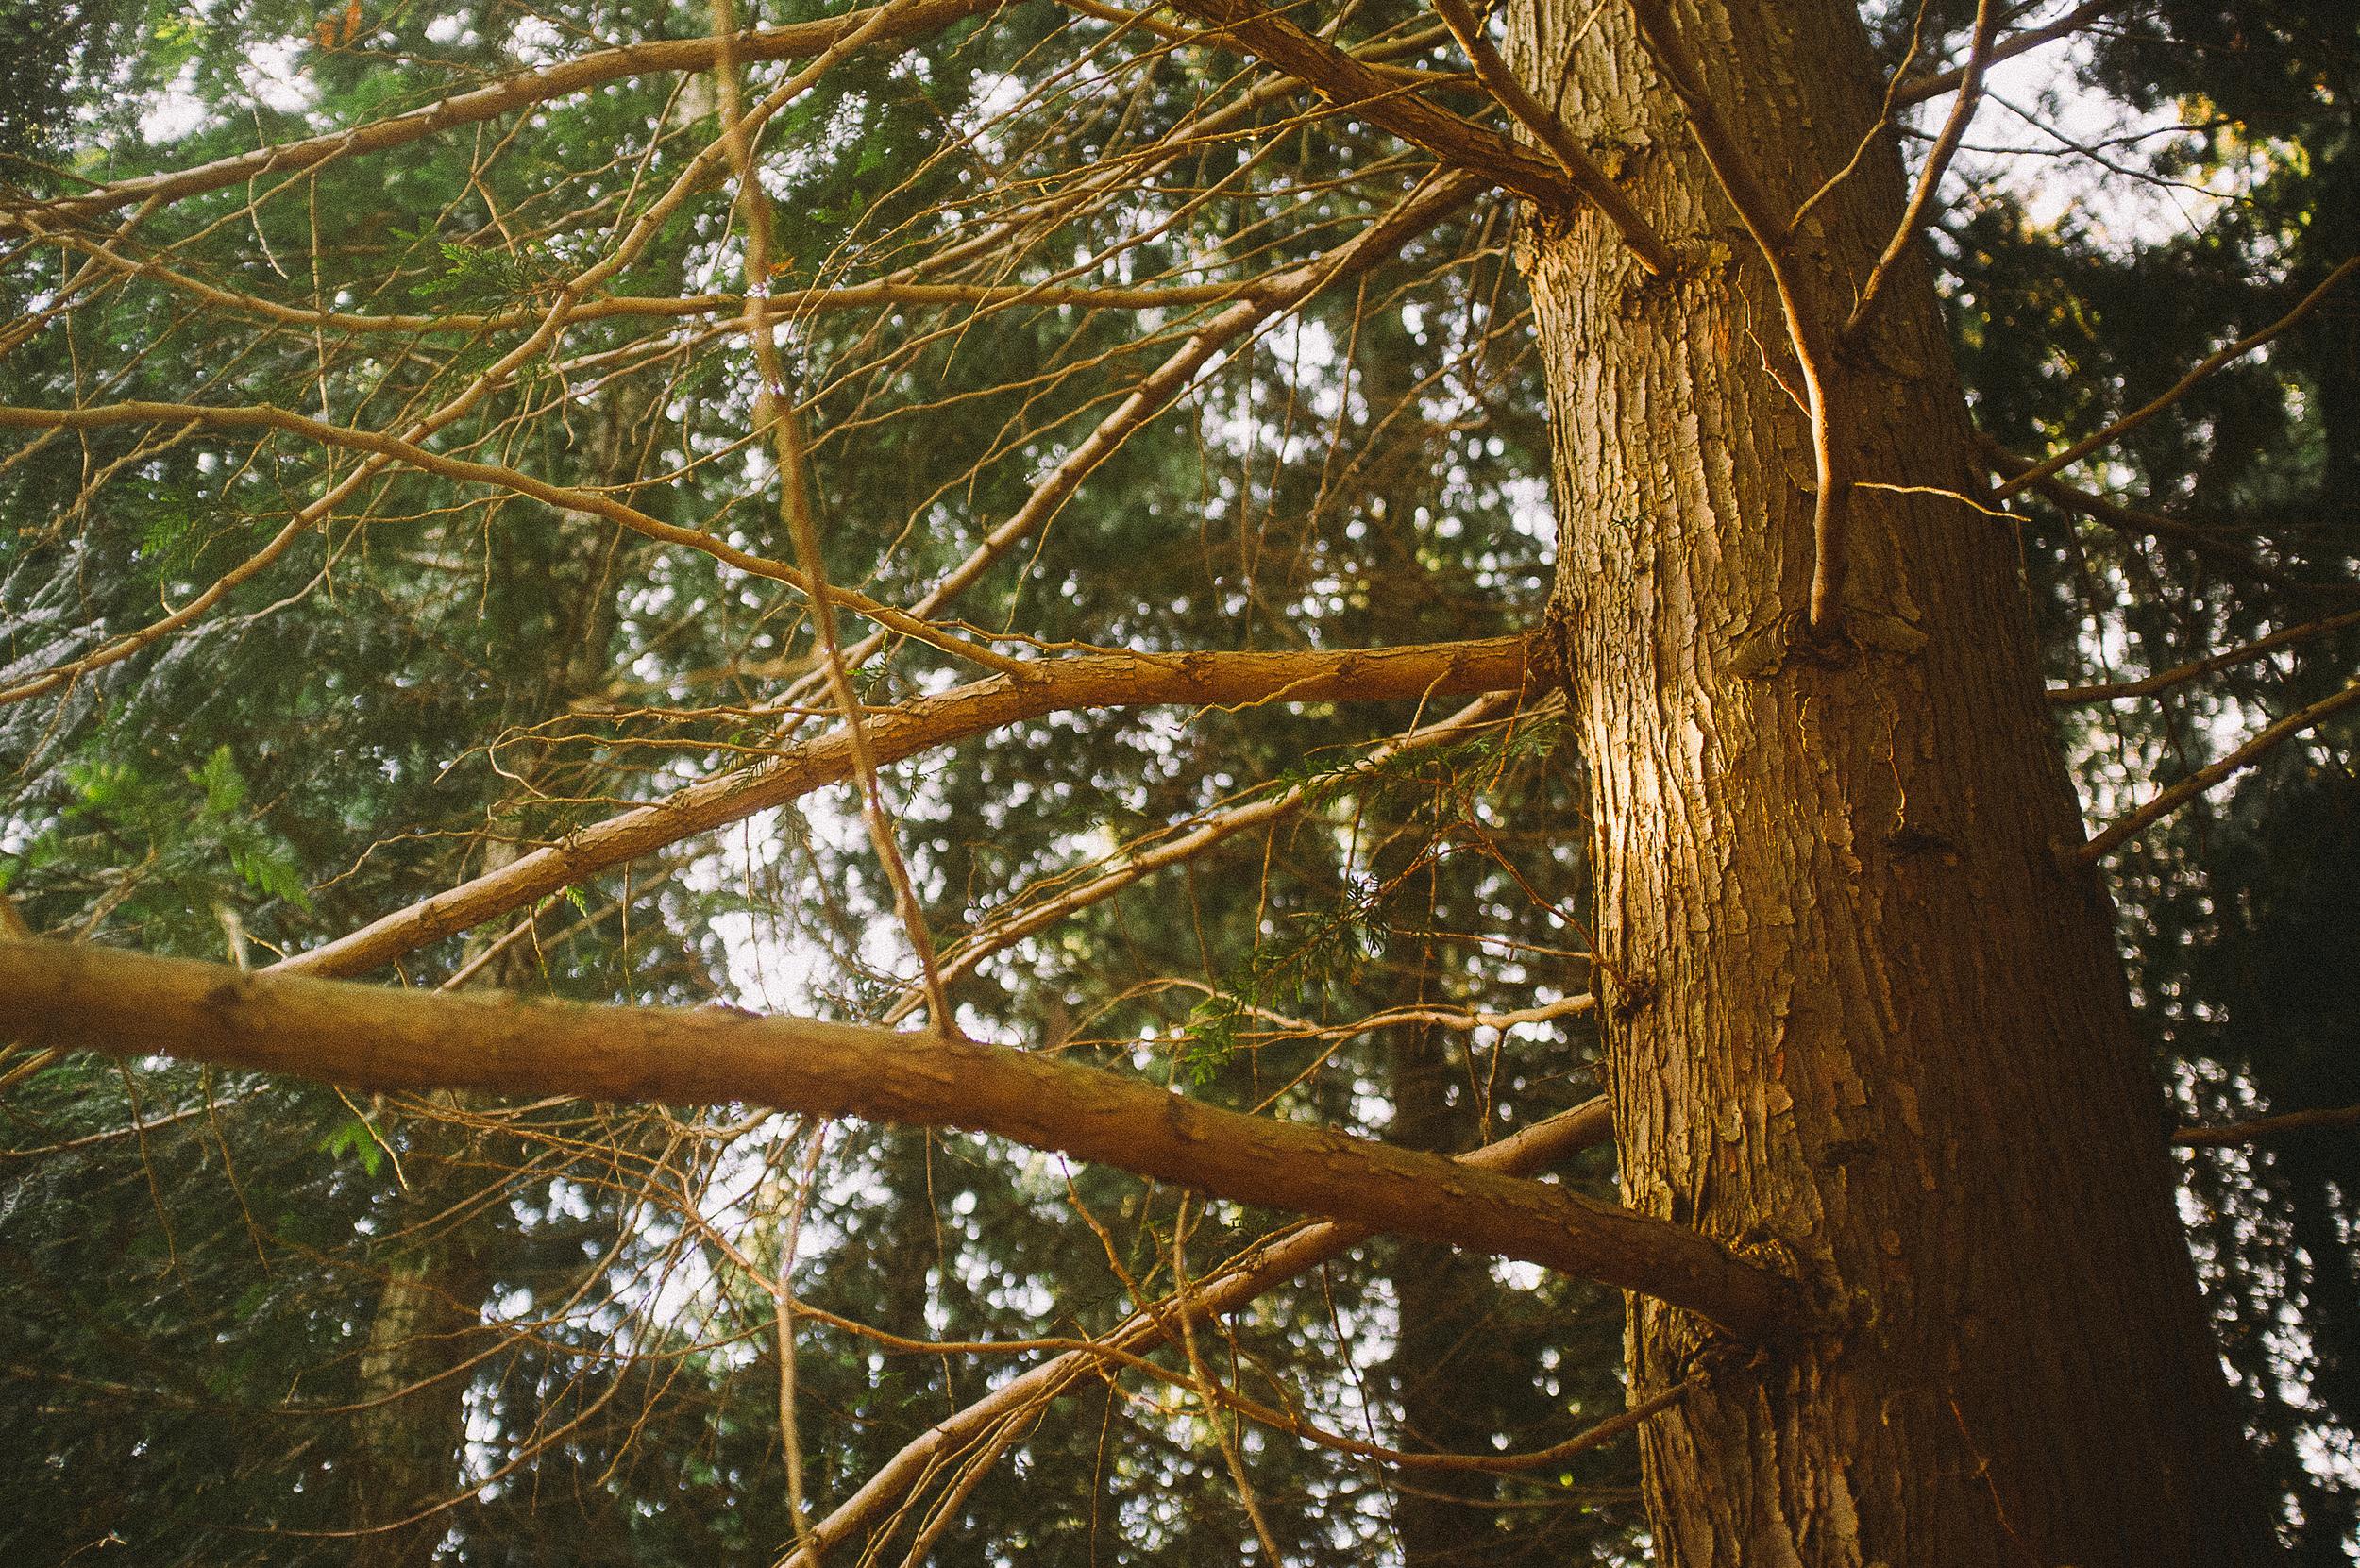 fuji x100 woods-1-12.jpg